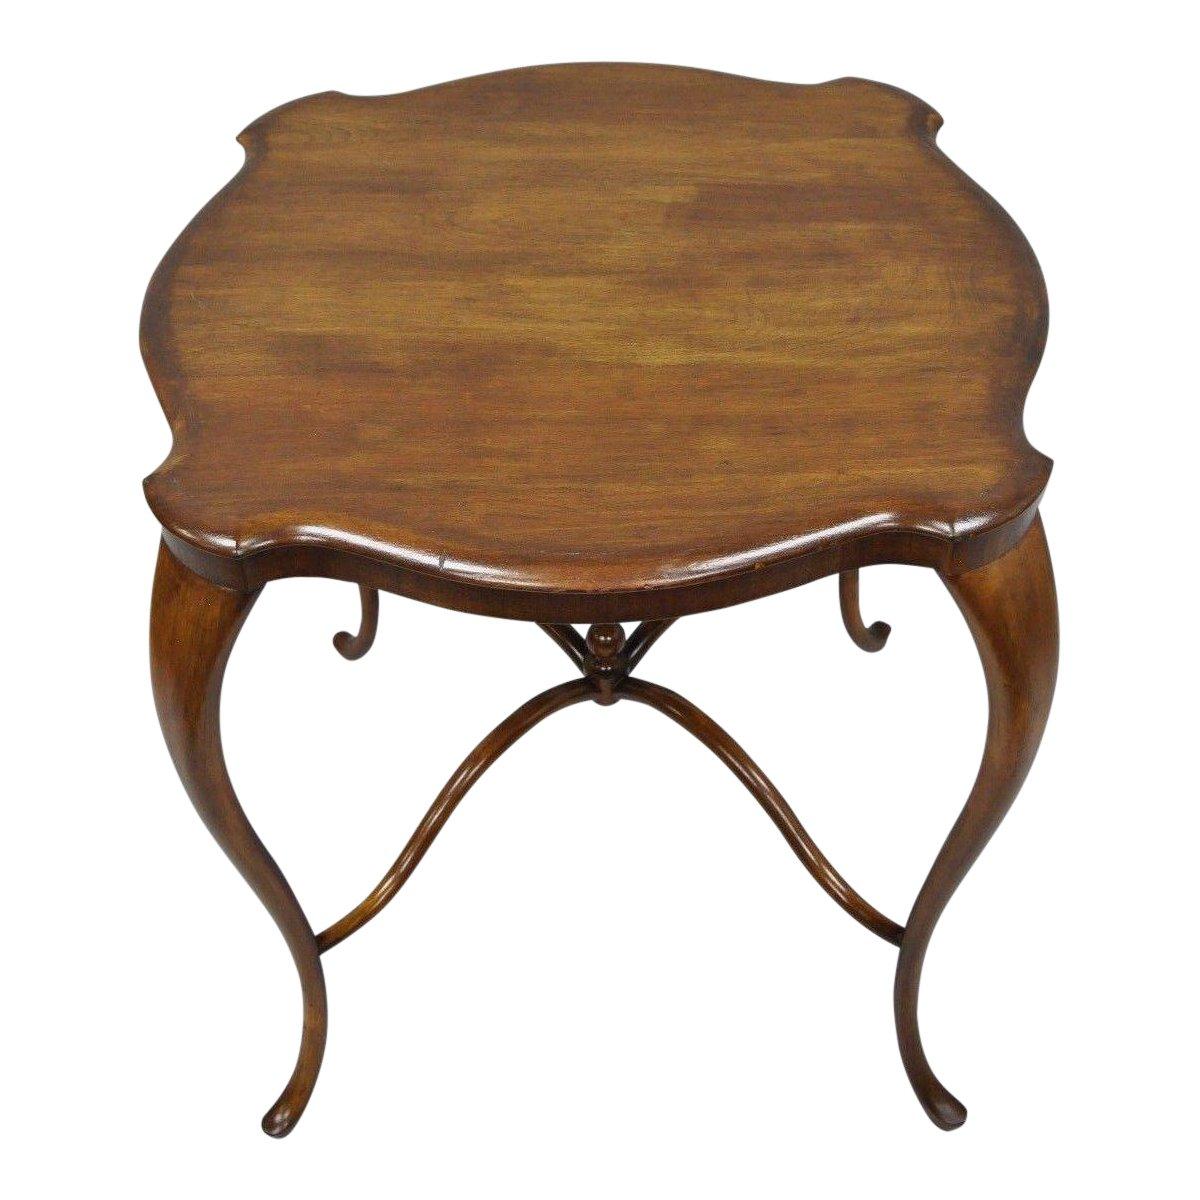 antique art nouveau victorian mahogany cabriole leg turtle top accent table chairish sofa ikea bedroom curtains threshold mango wood end tables edmonton clear coffee acrylic sams